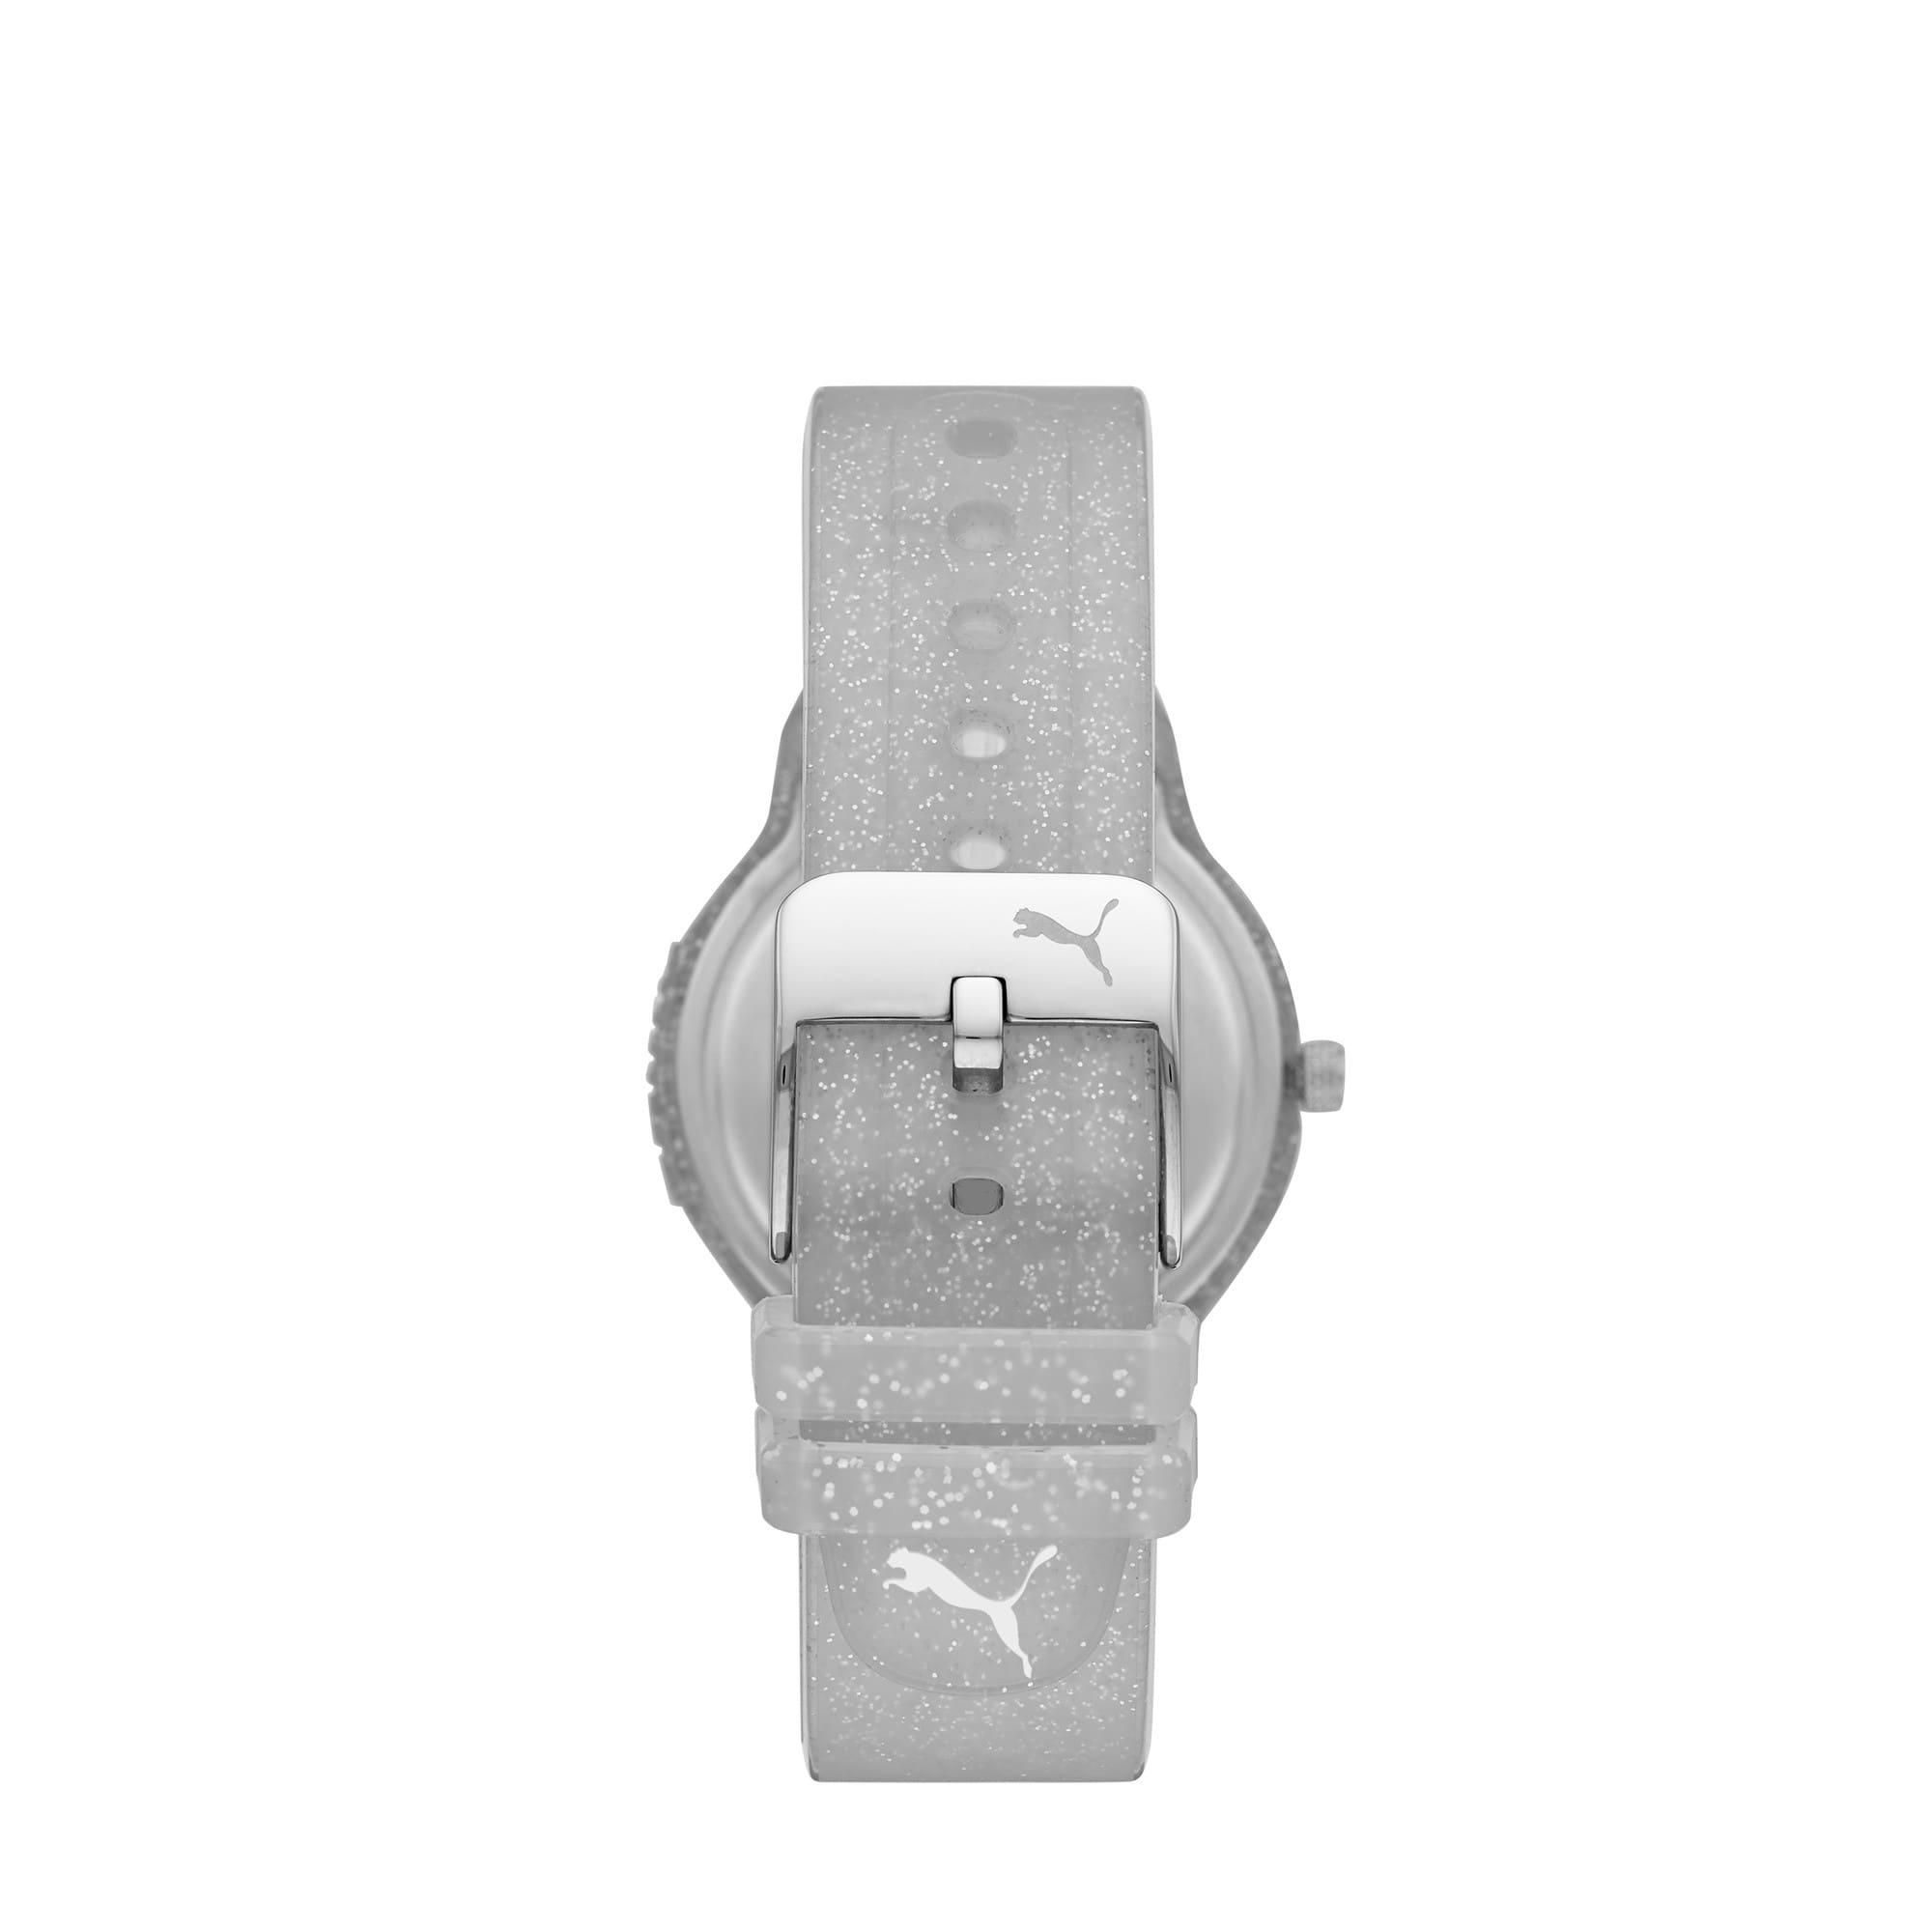 Thumbnail 3 of Reset v2 Watch, Silver/Silver, medium